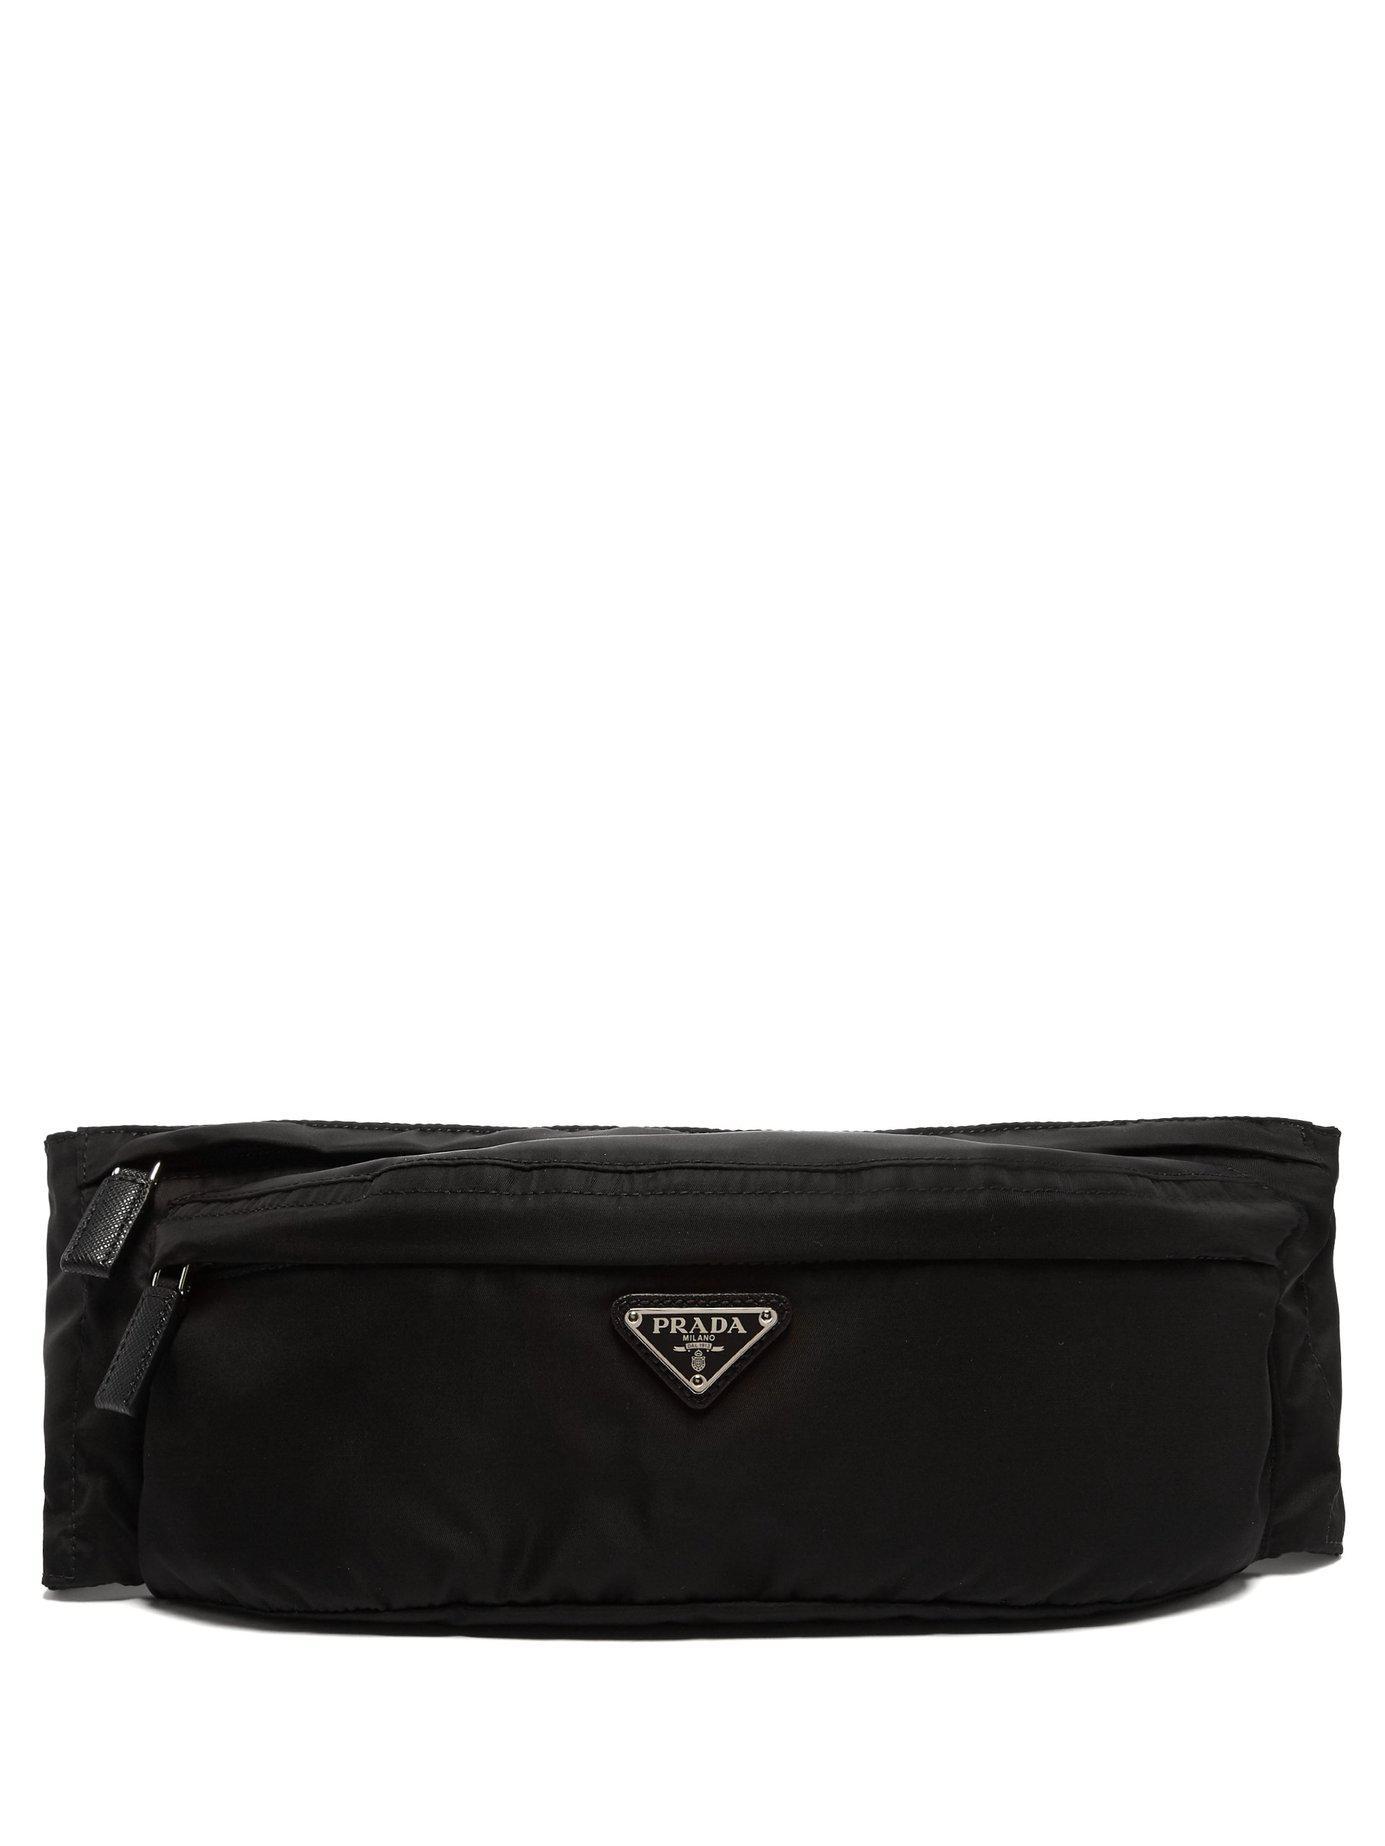 Lyst - Prada Black Nylon Belt Bag in Black for Men - Save 5% 0186f0399f5e0